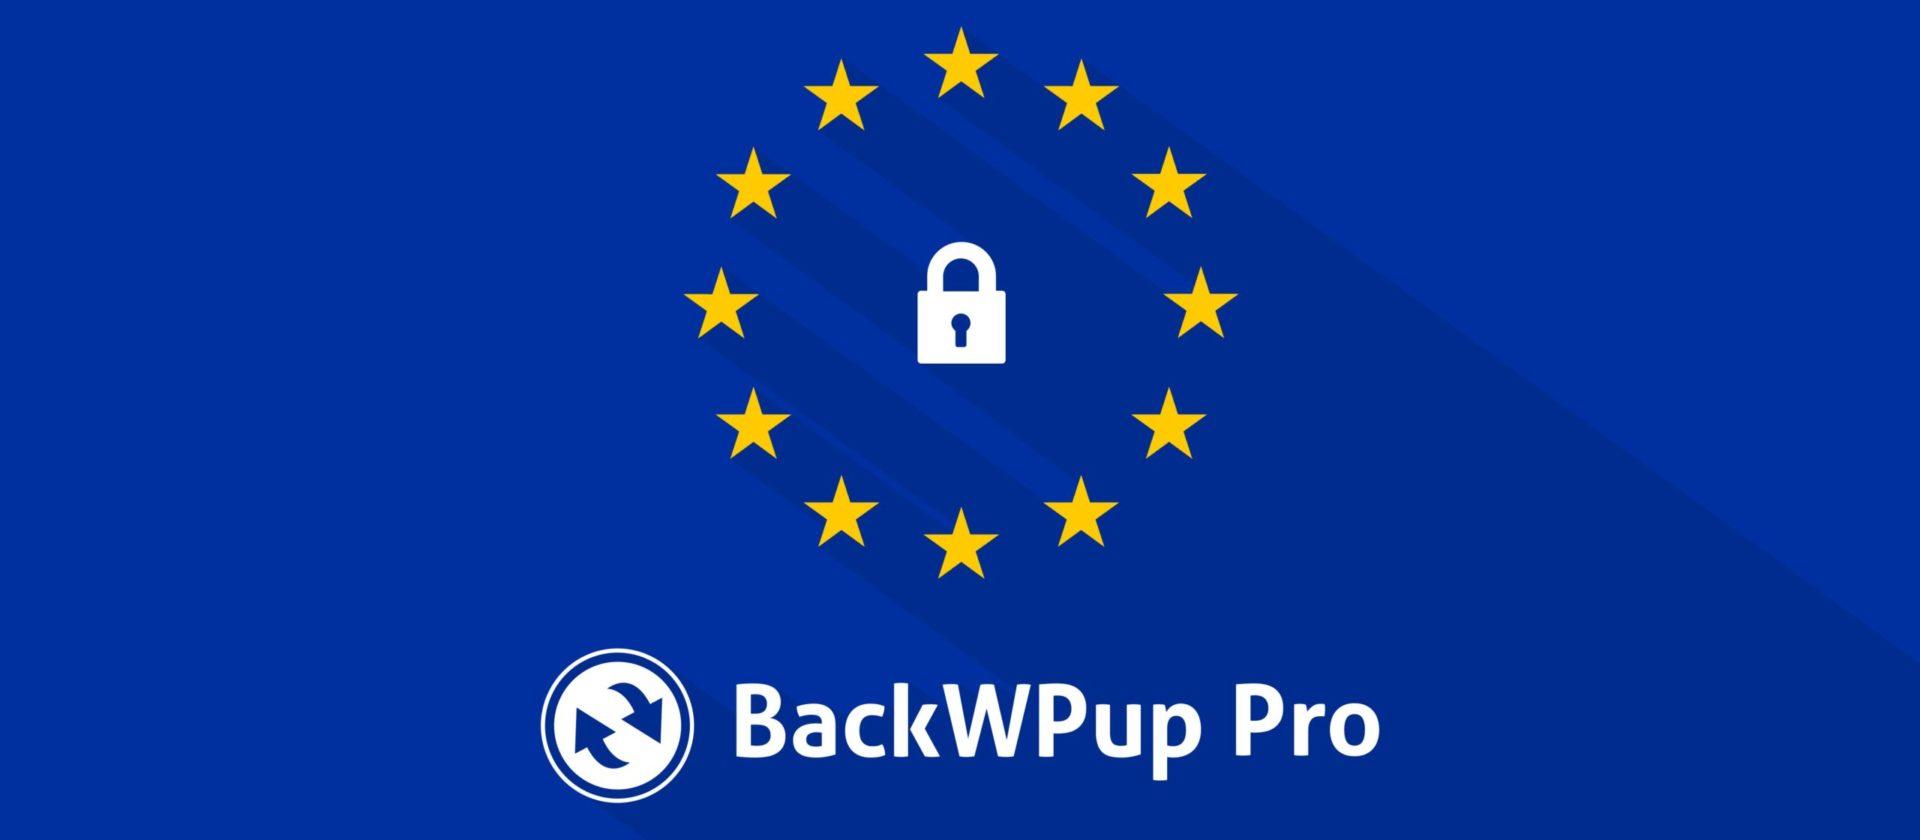 Backup Plugin DSGVO konform haben: mit BackWPup PRO